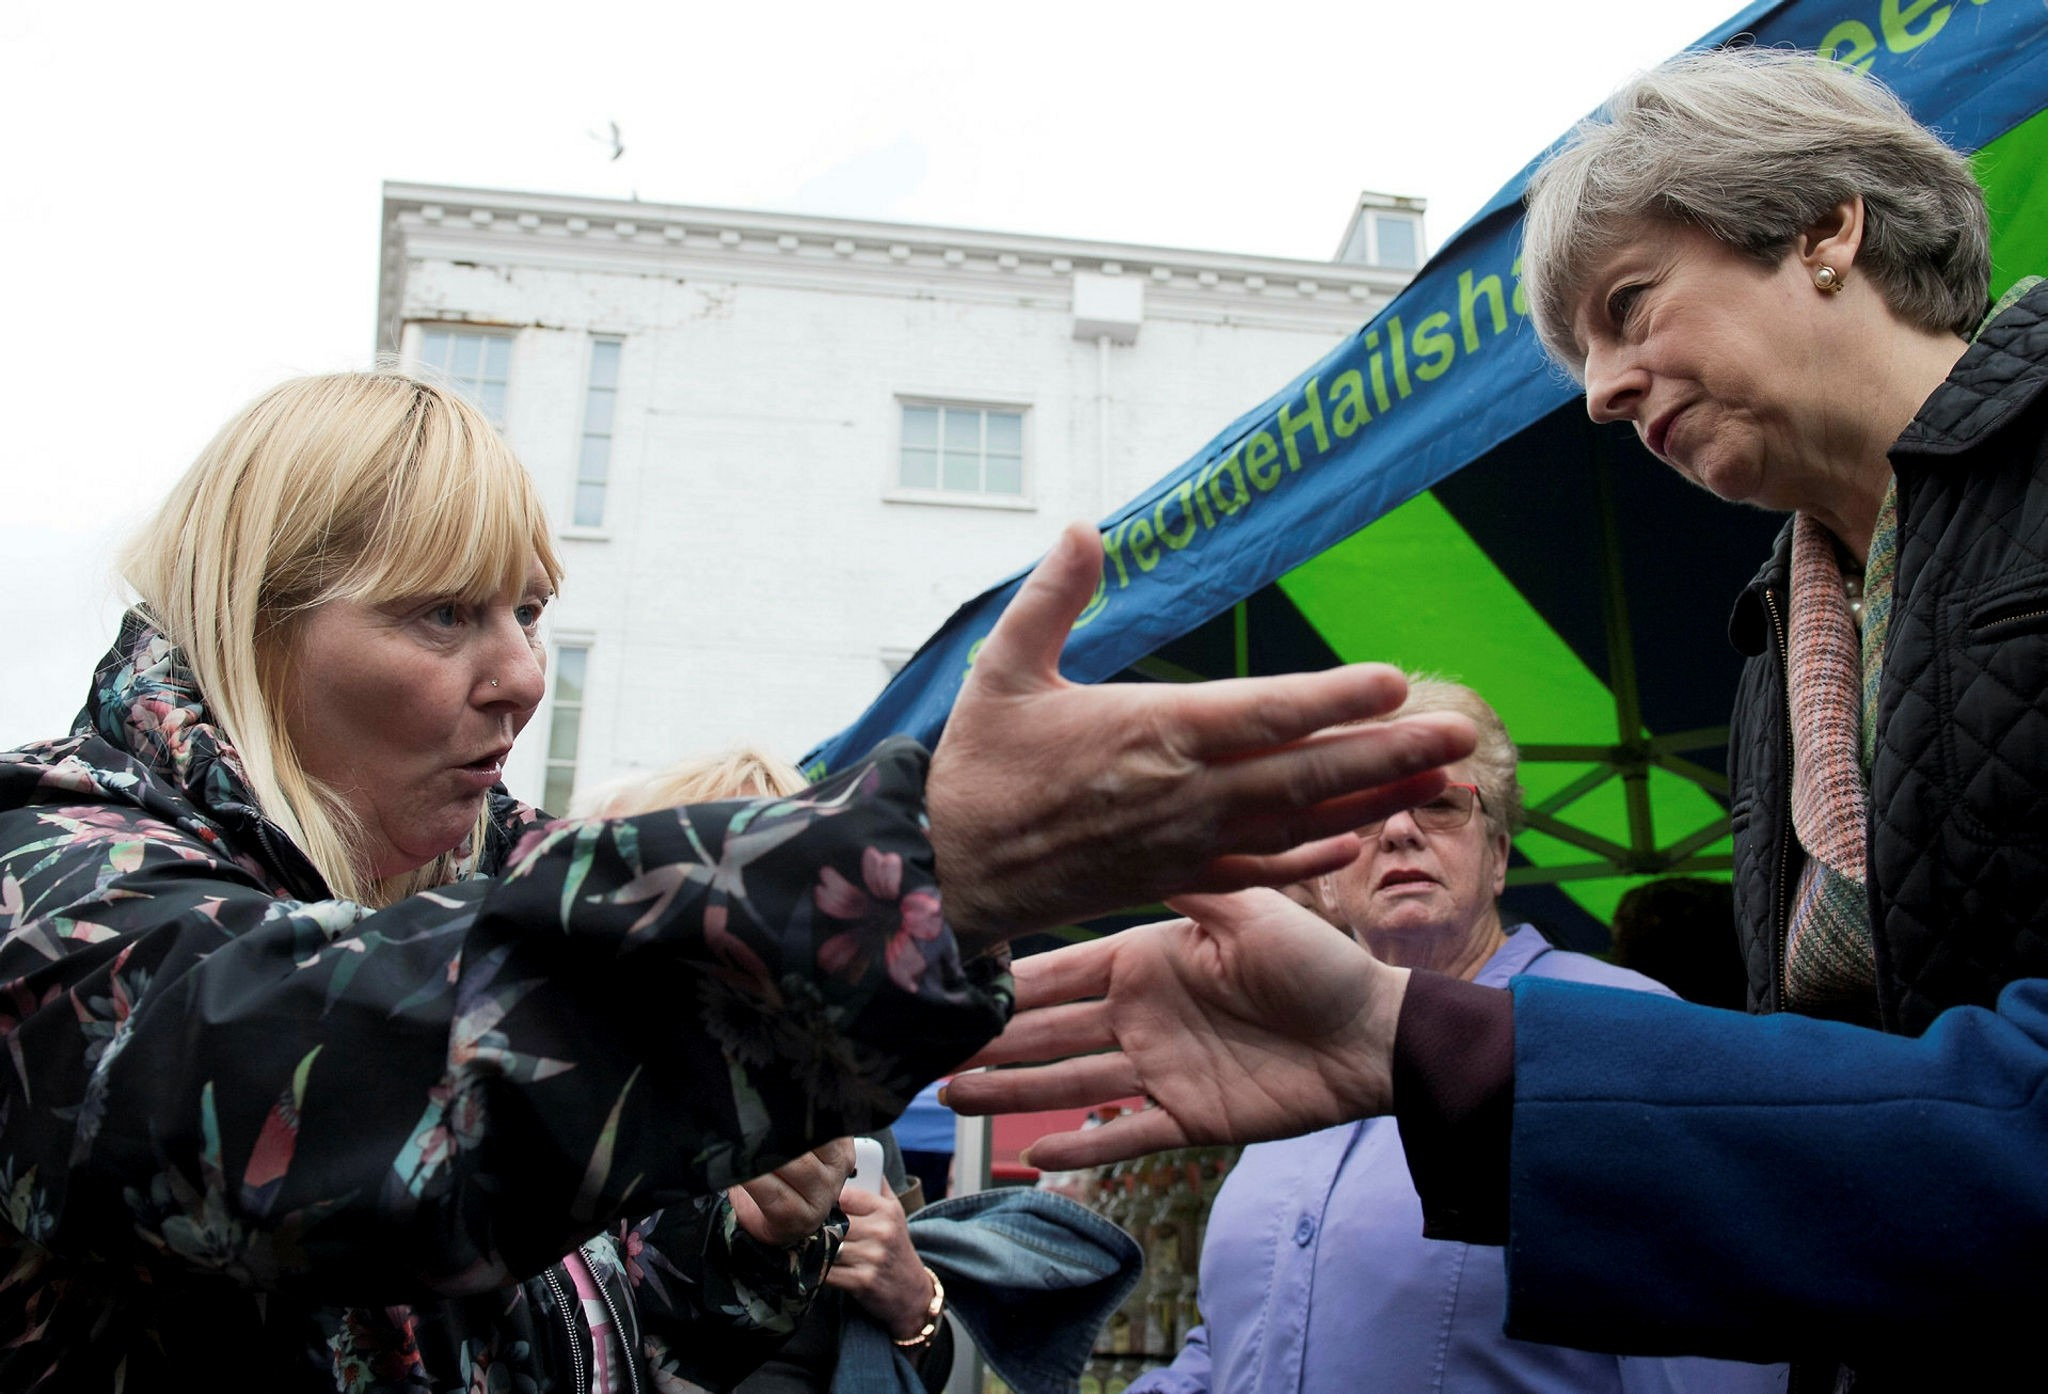 Britain's Prime Minister Theresa May makes a campaign visit to Abingdon Market near Oxford, May 15, 2017. (Reuters Photo)